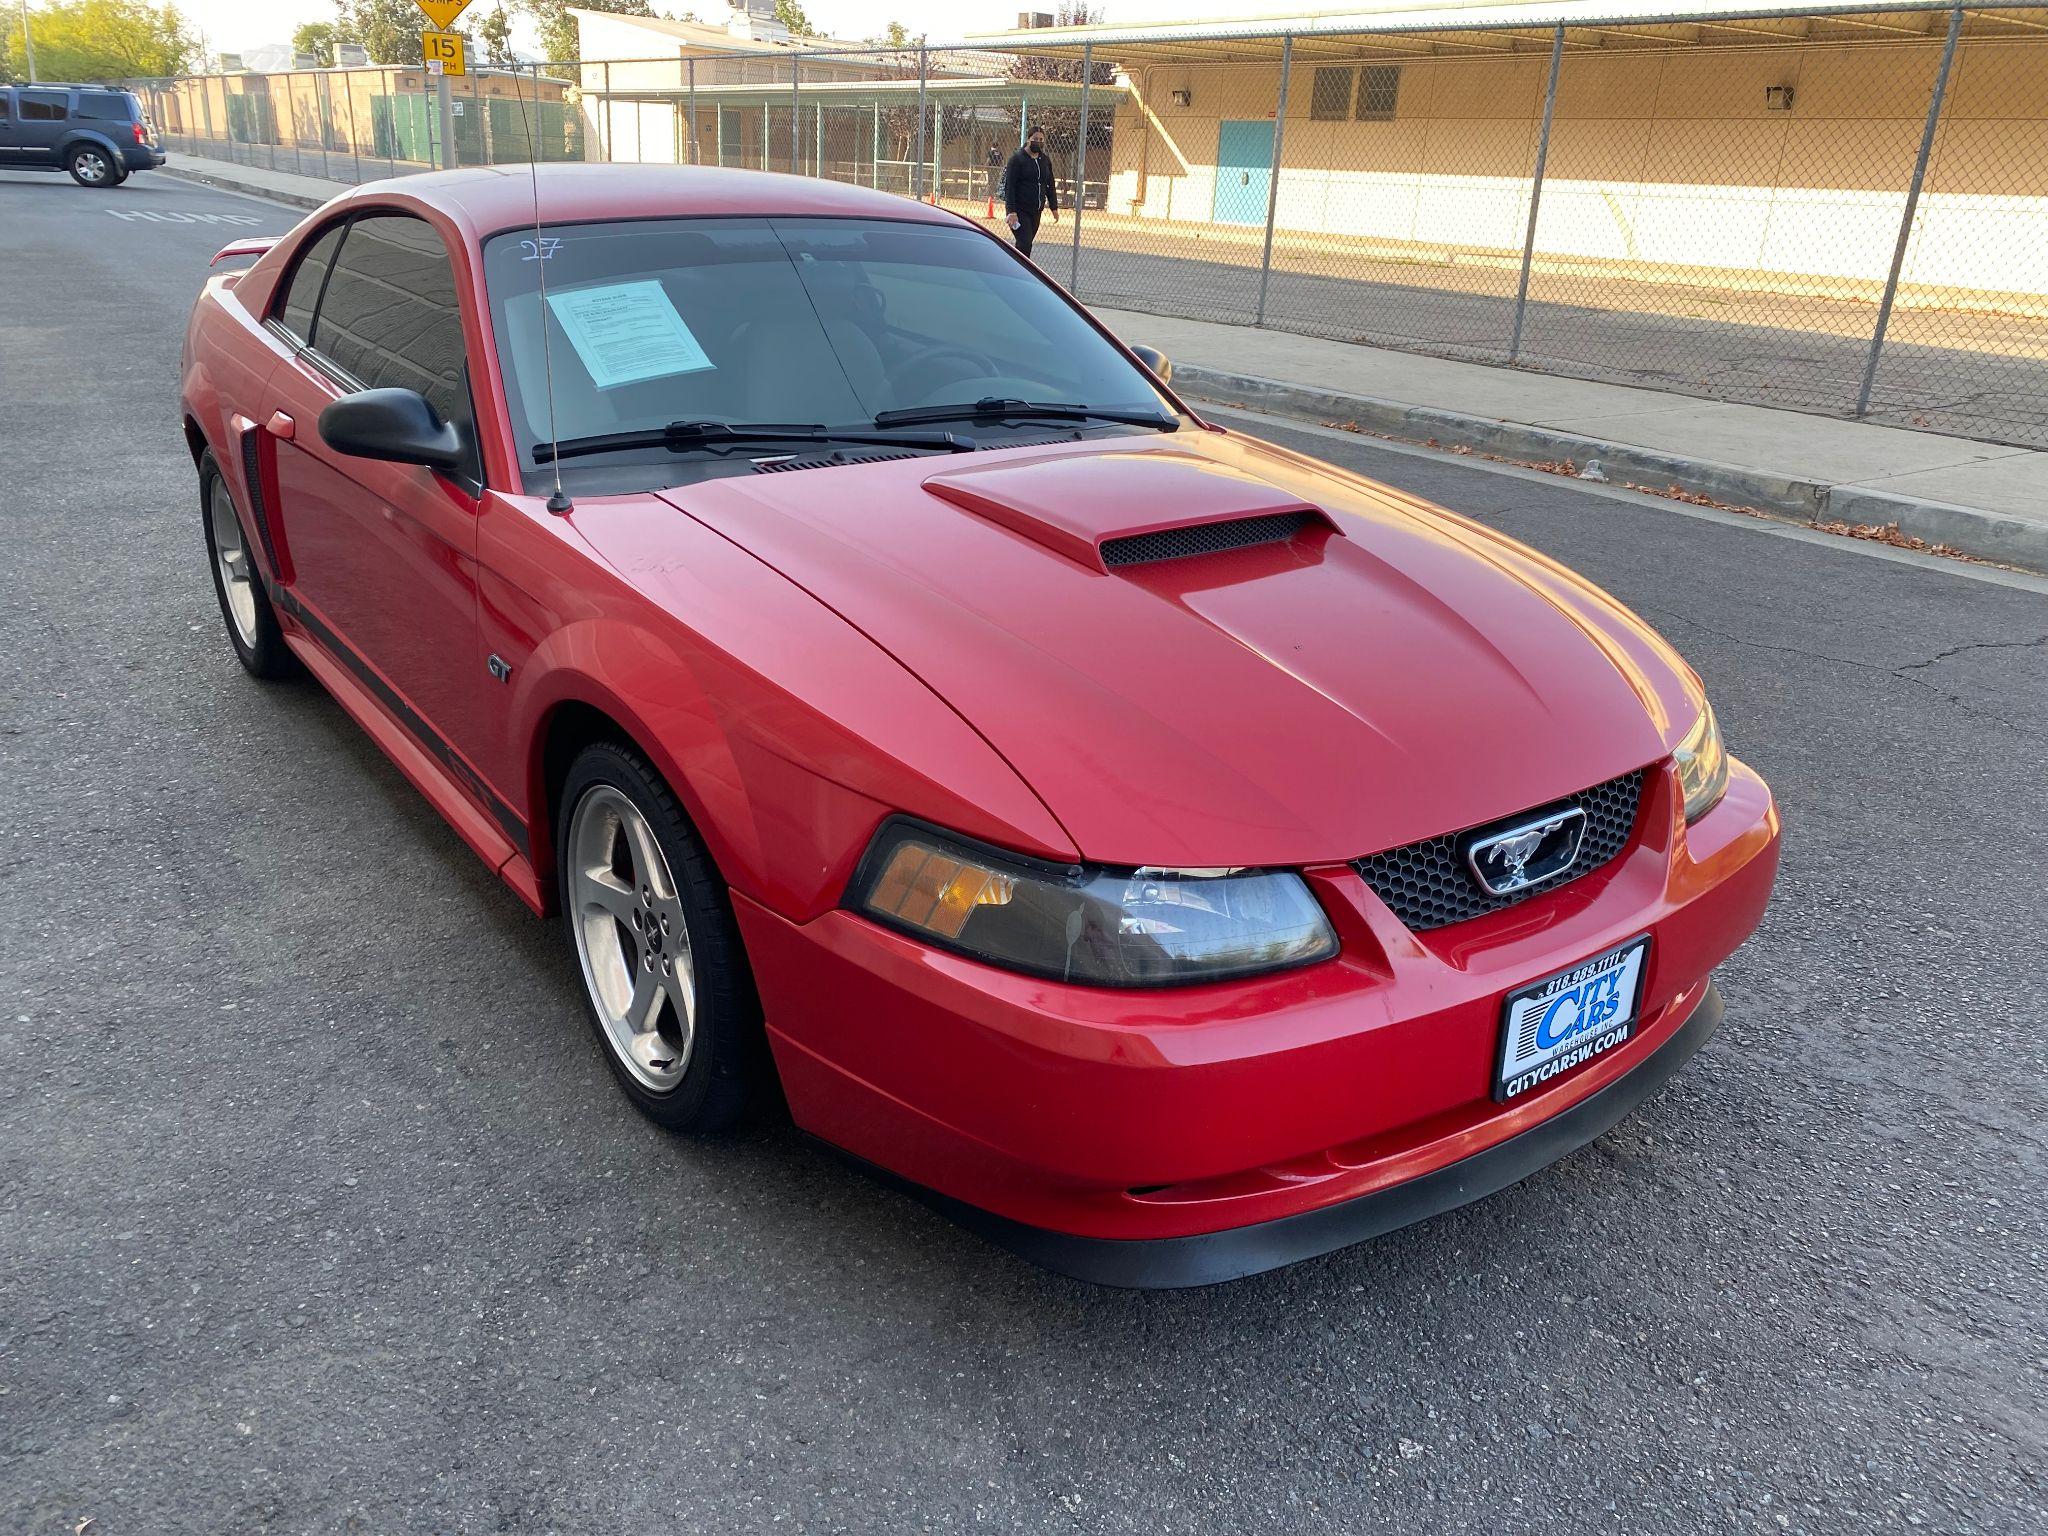 2003 Ford Mustang GT Premium